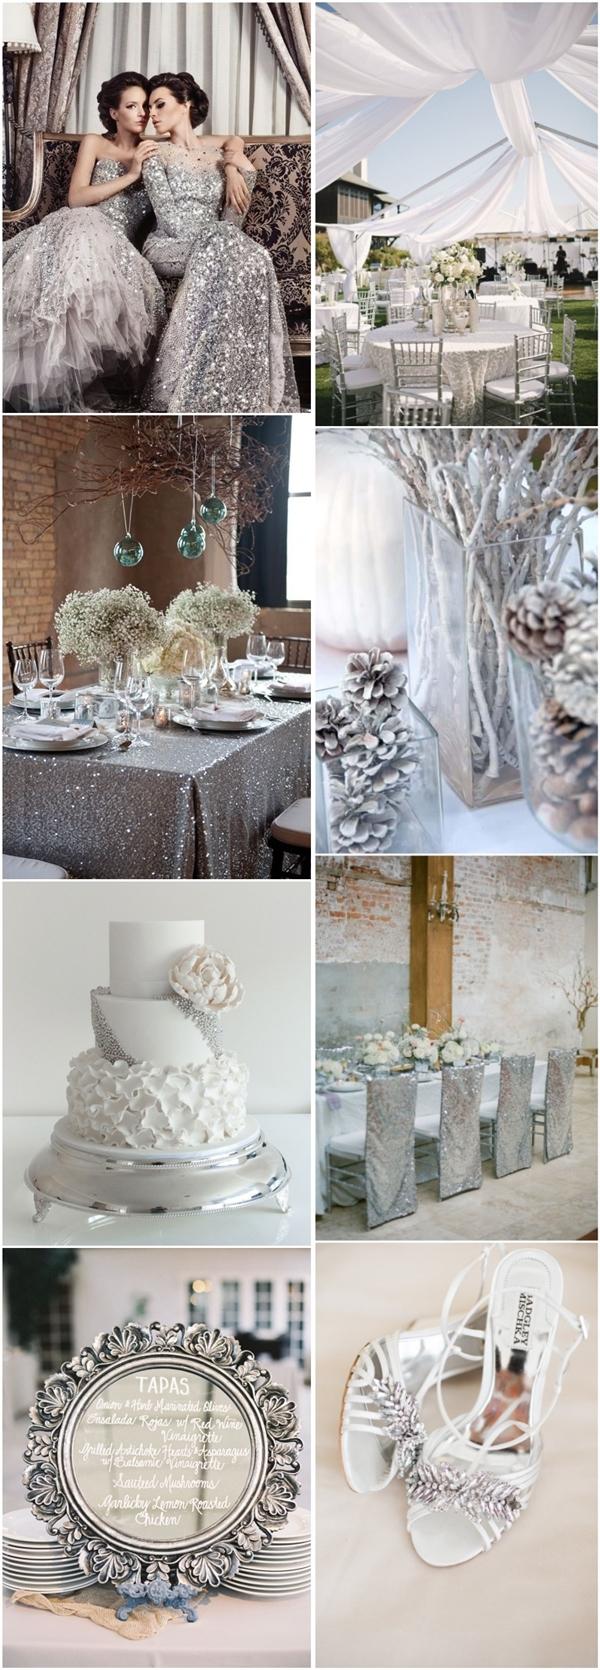 Ideal Wedding Decorations